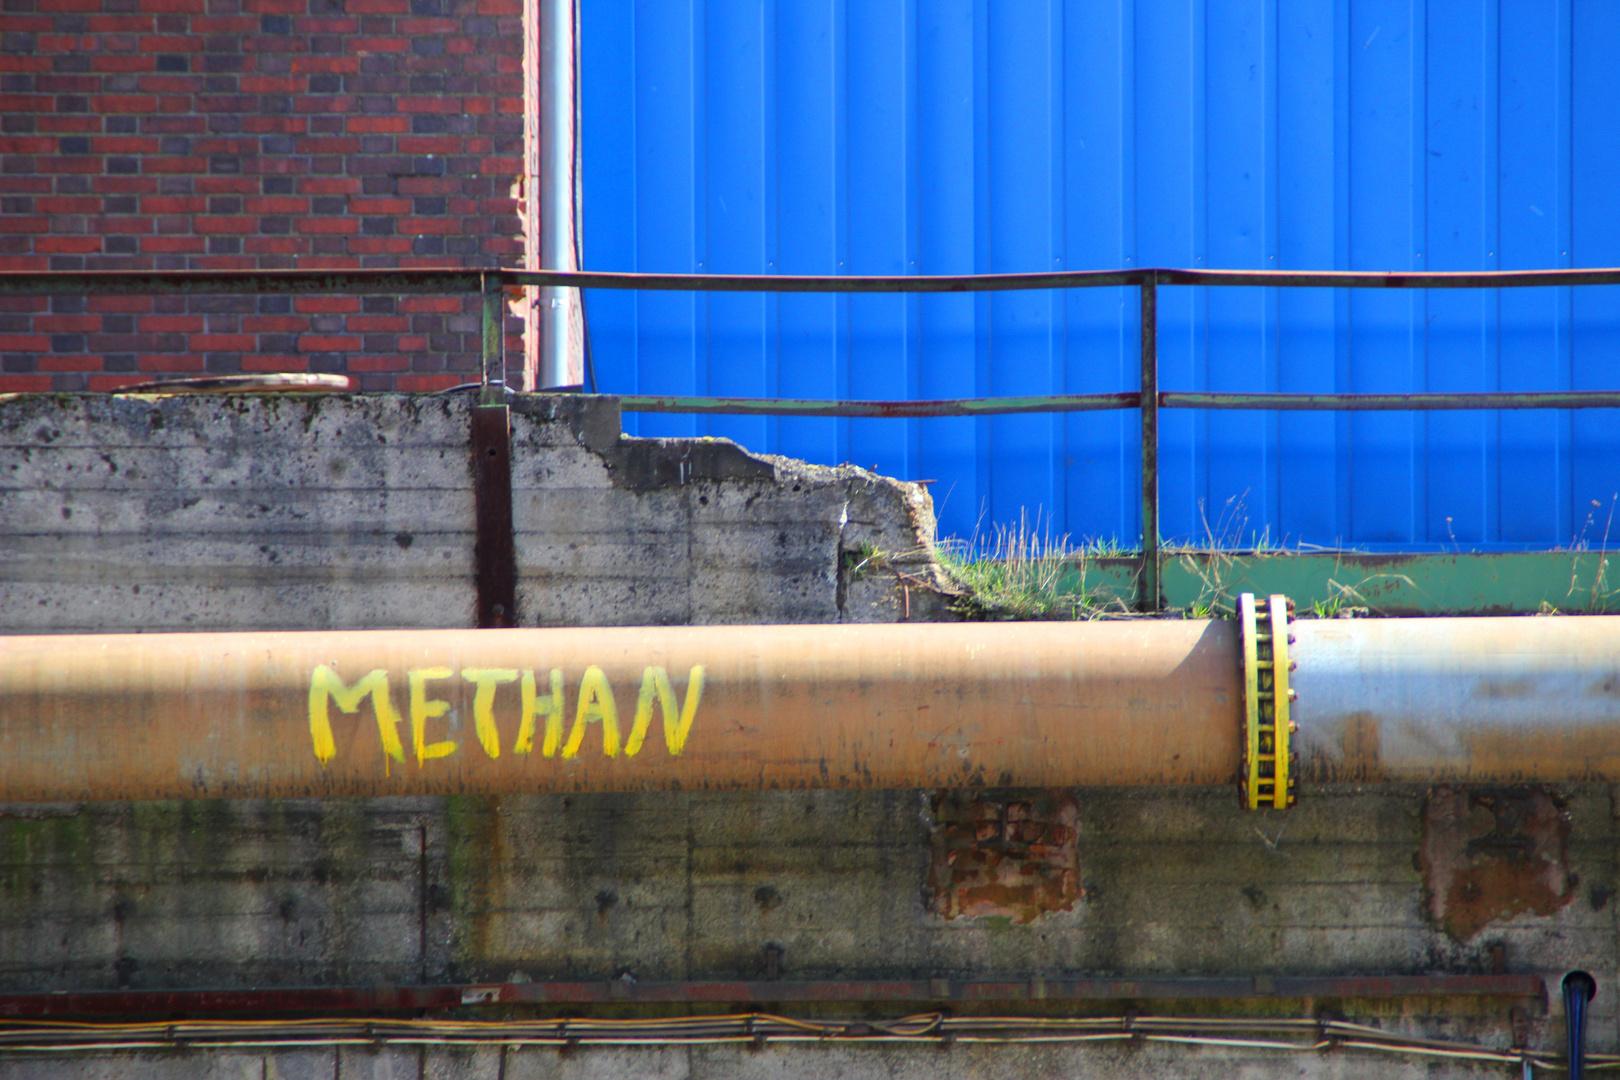 Methanleitung